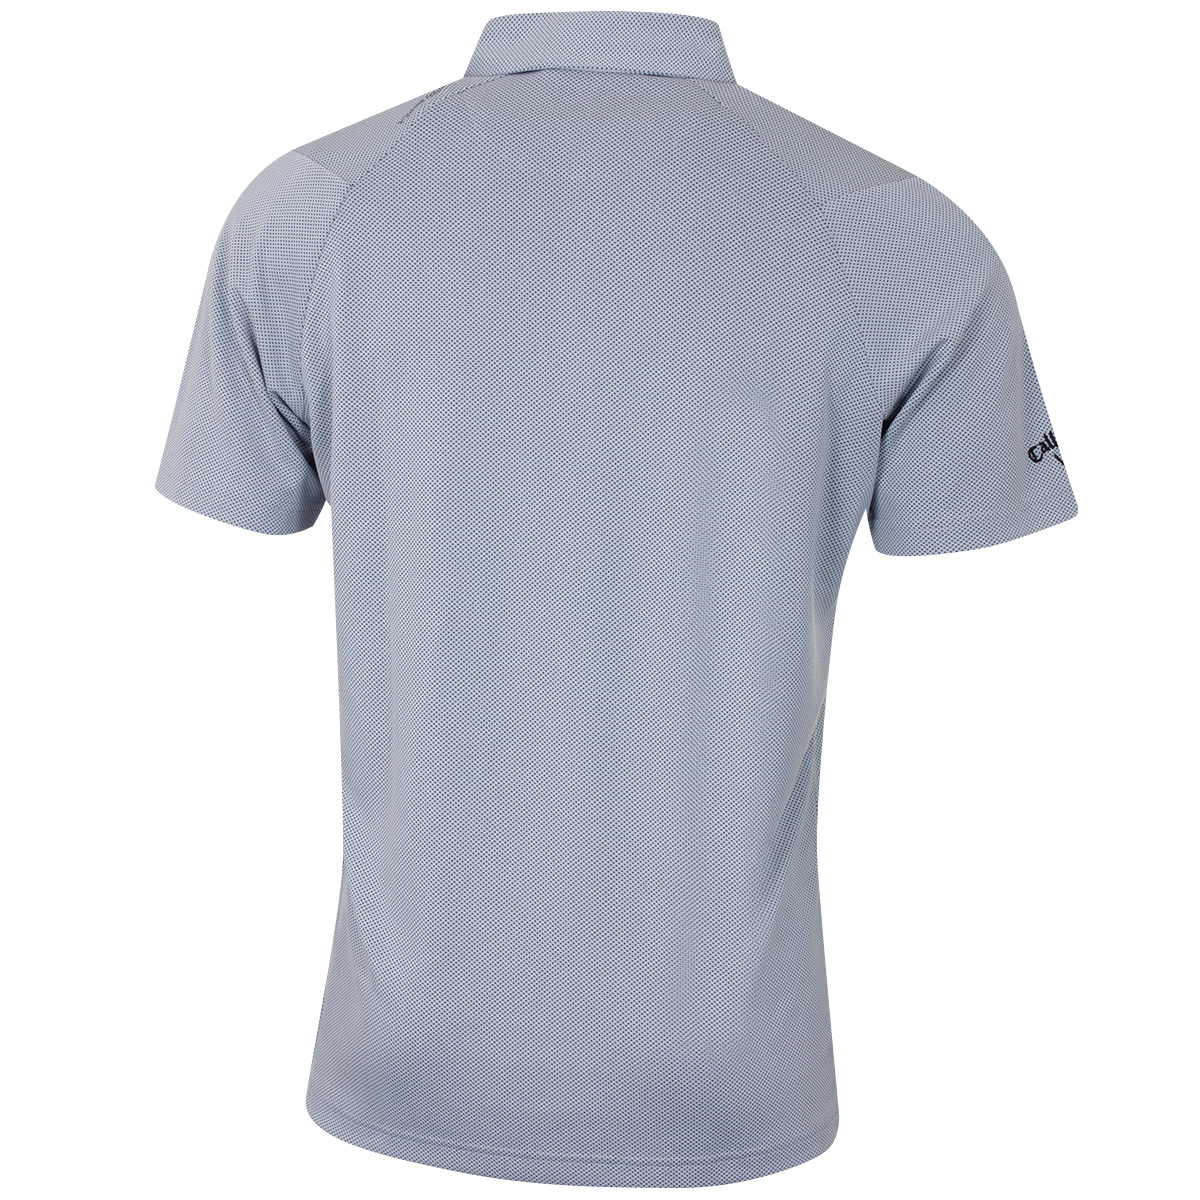 Callaway-Mens-New-Box-Jacquard-Tour-Opti-Dri-Golf-Polo-Shirt-45-OFF-RRP thumbnail 6